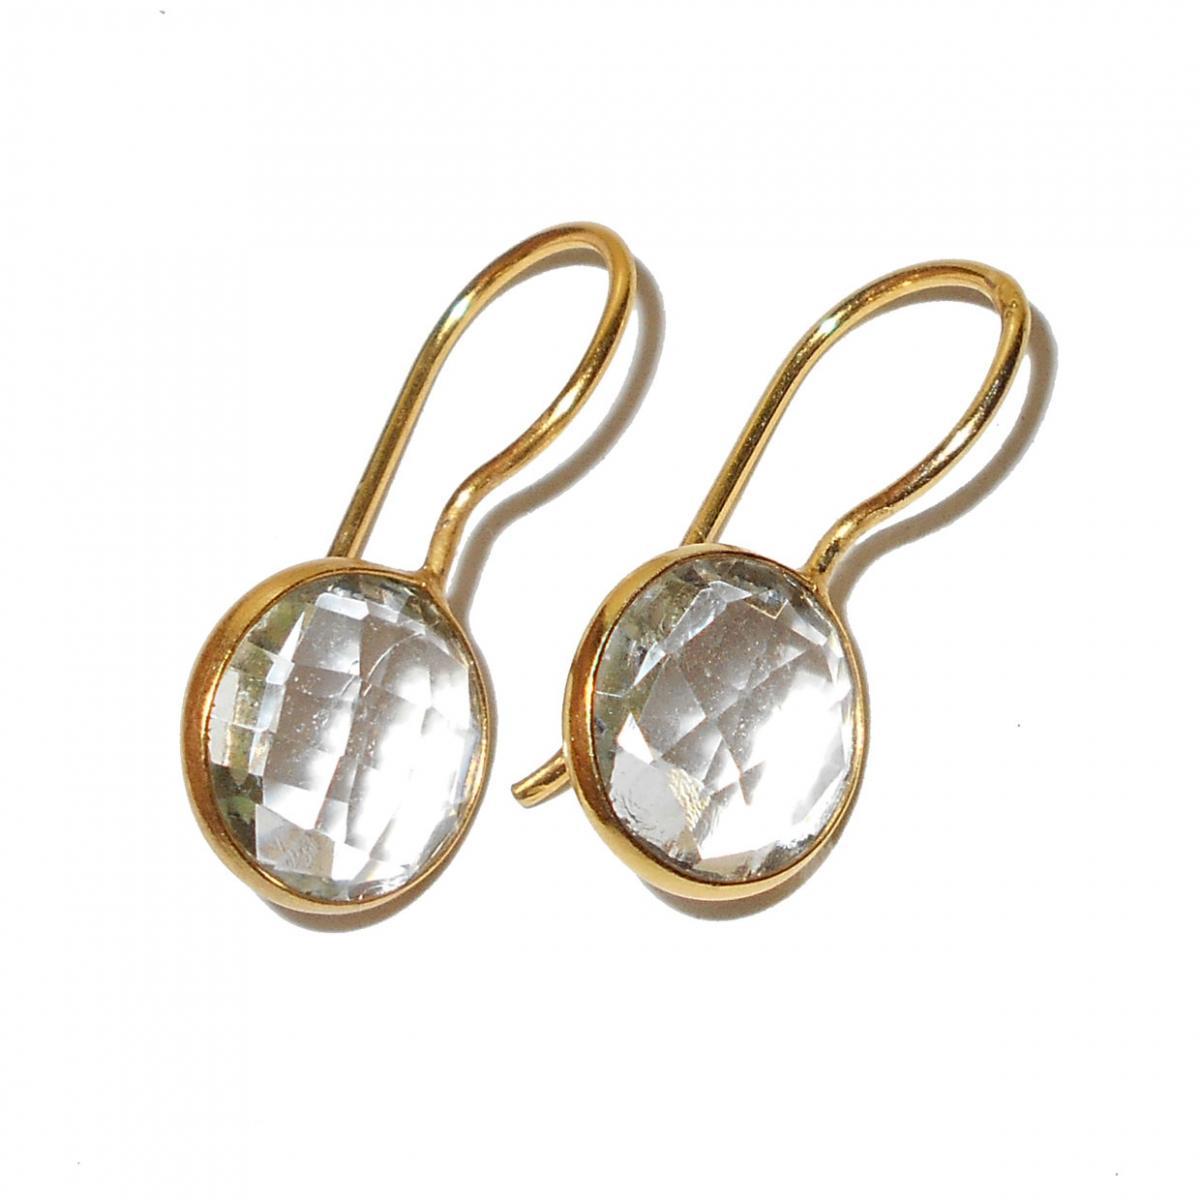 Crystal Quartz Cut B Bjs933 Fashion Style Bezel Setting Gold Vermeil Earrings With